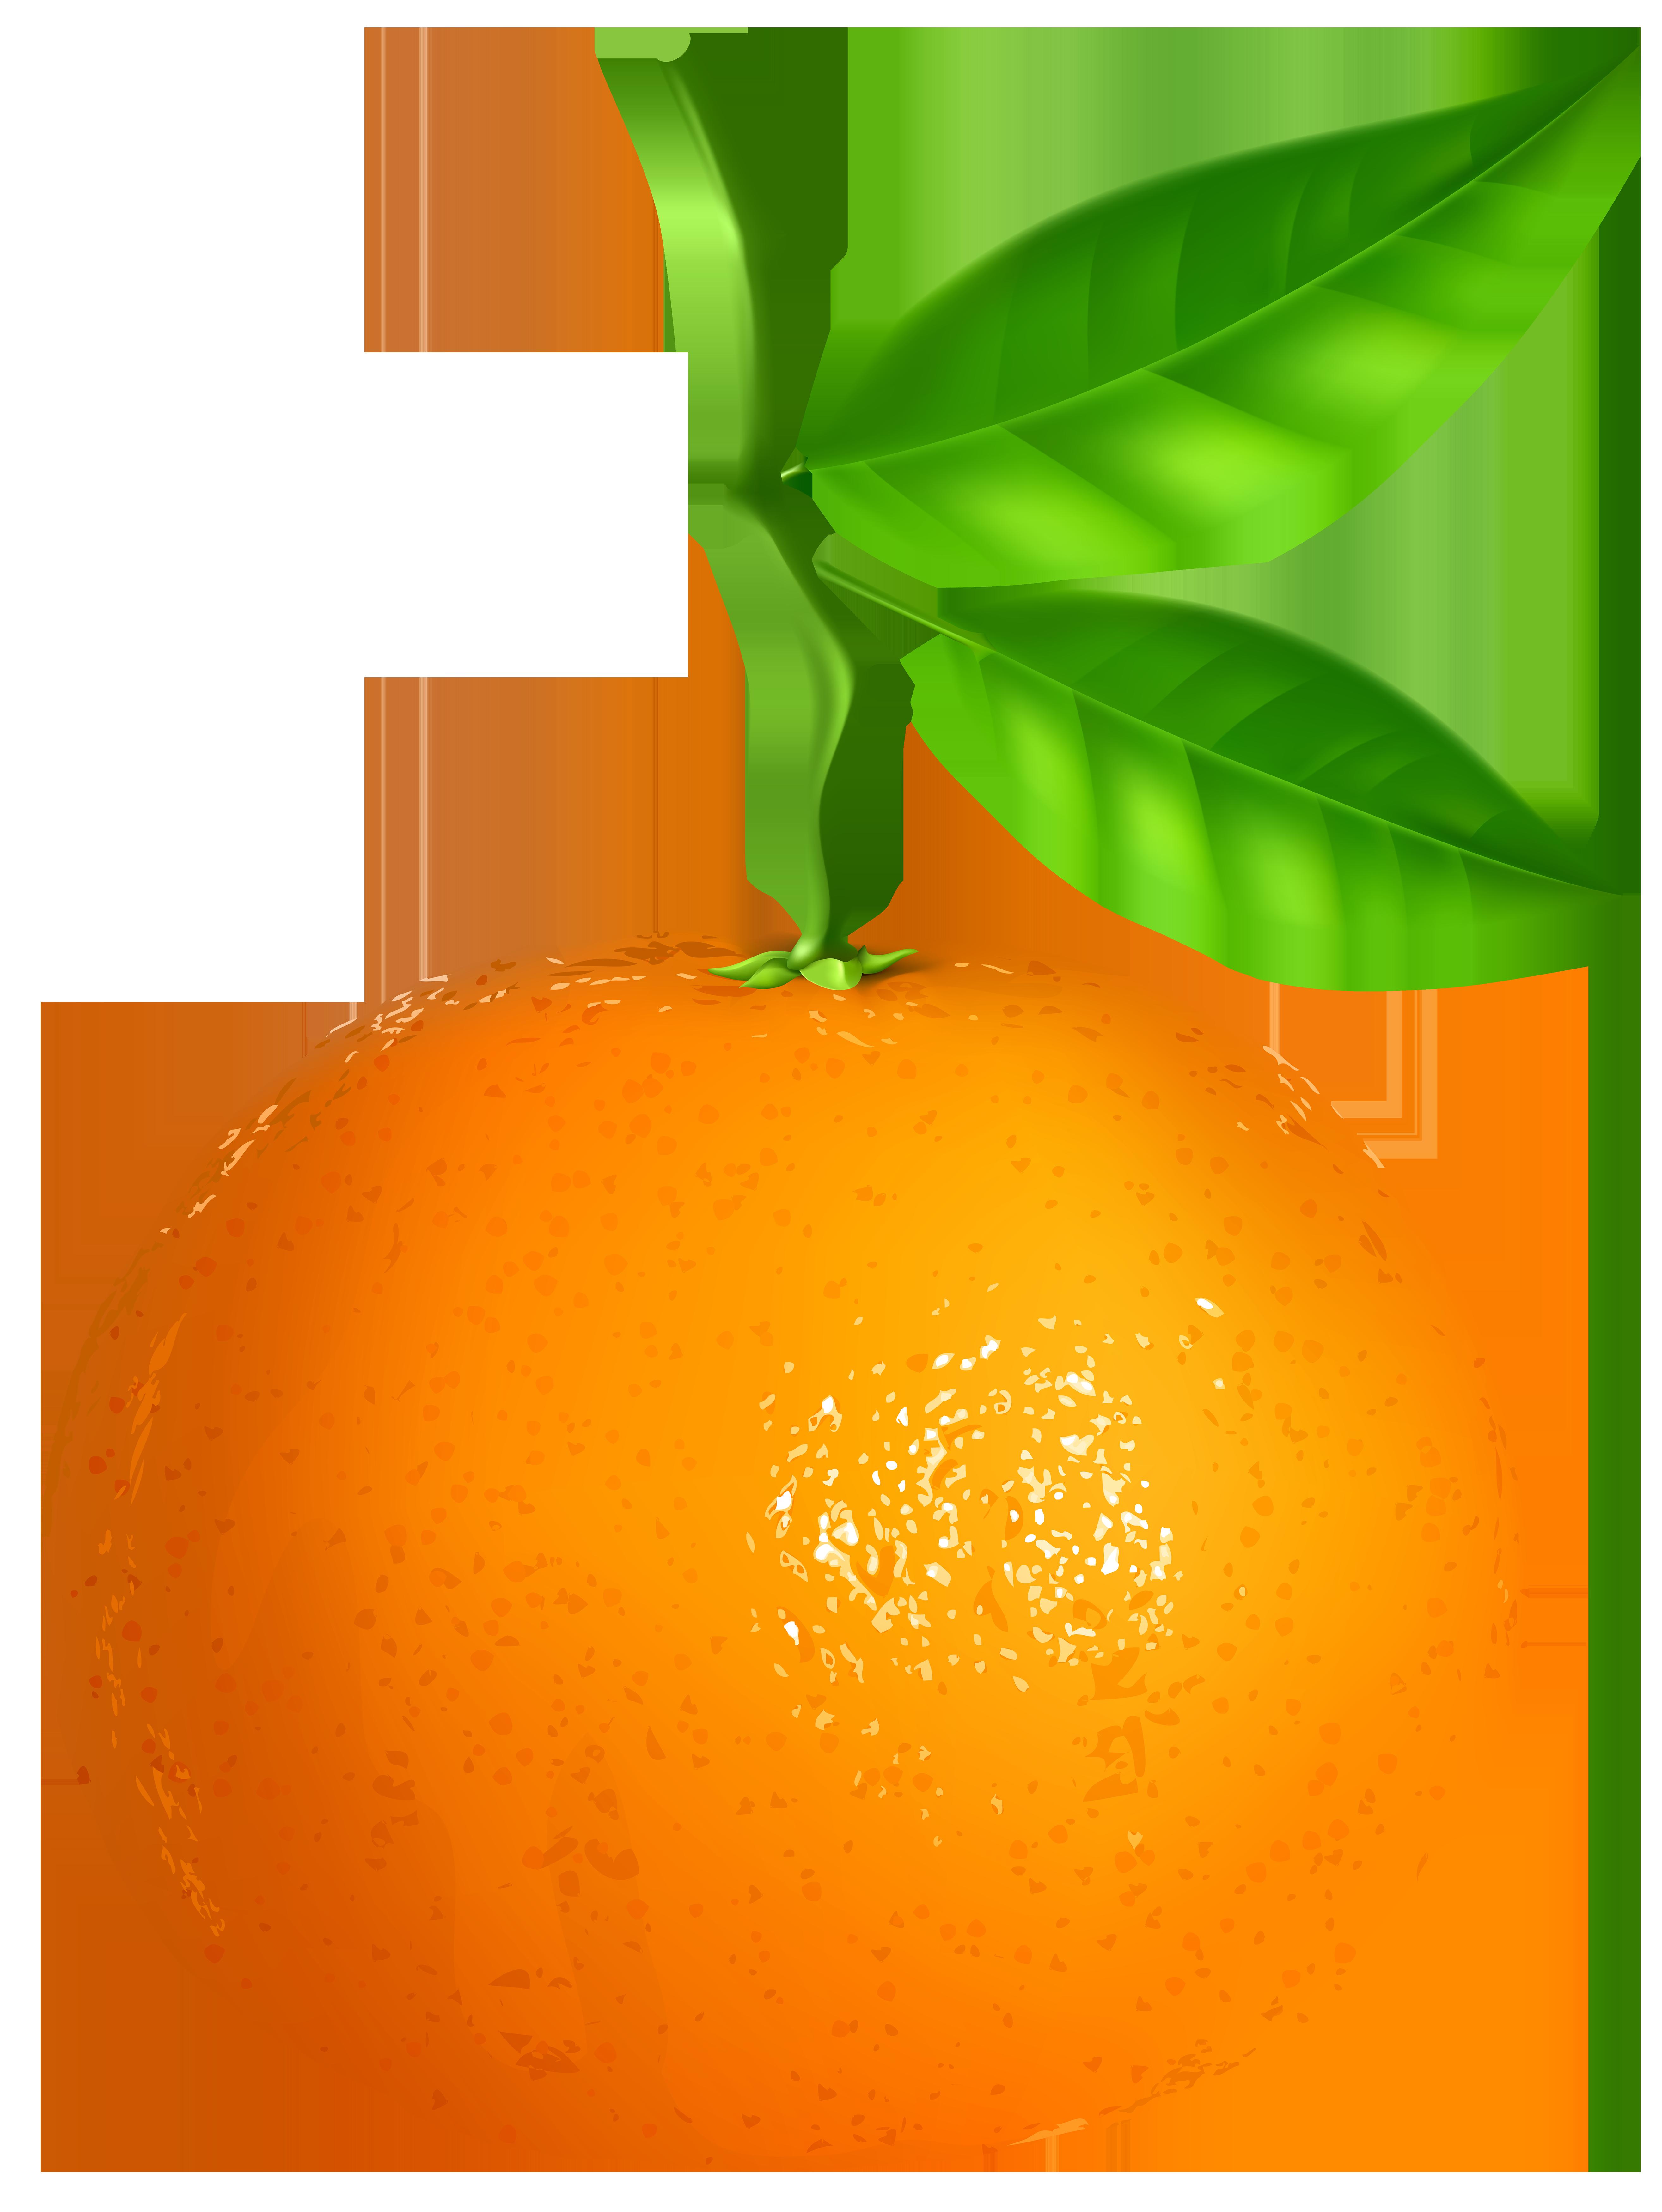 Tangerine clipart Tangerine Image Transparent Art Yopriceville